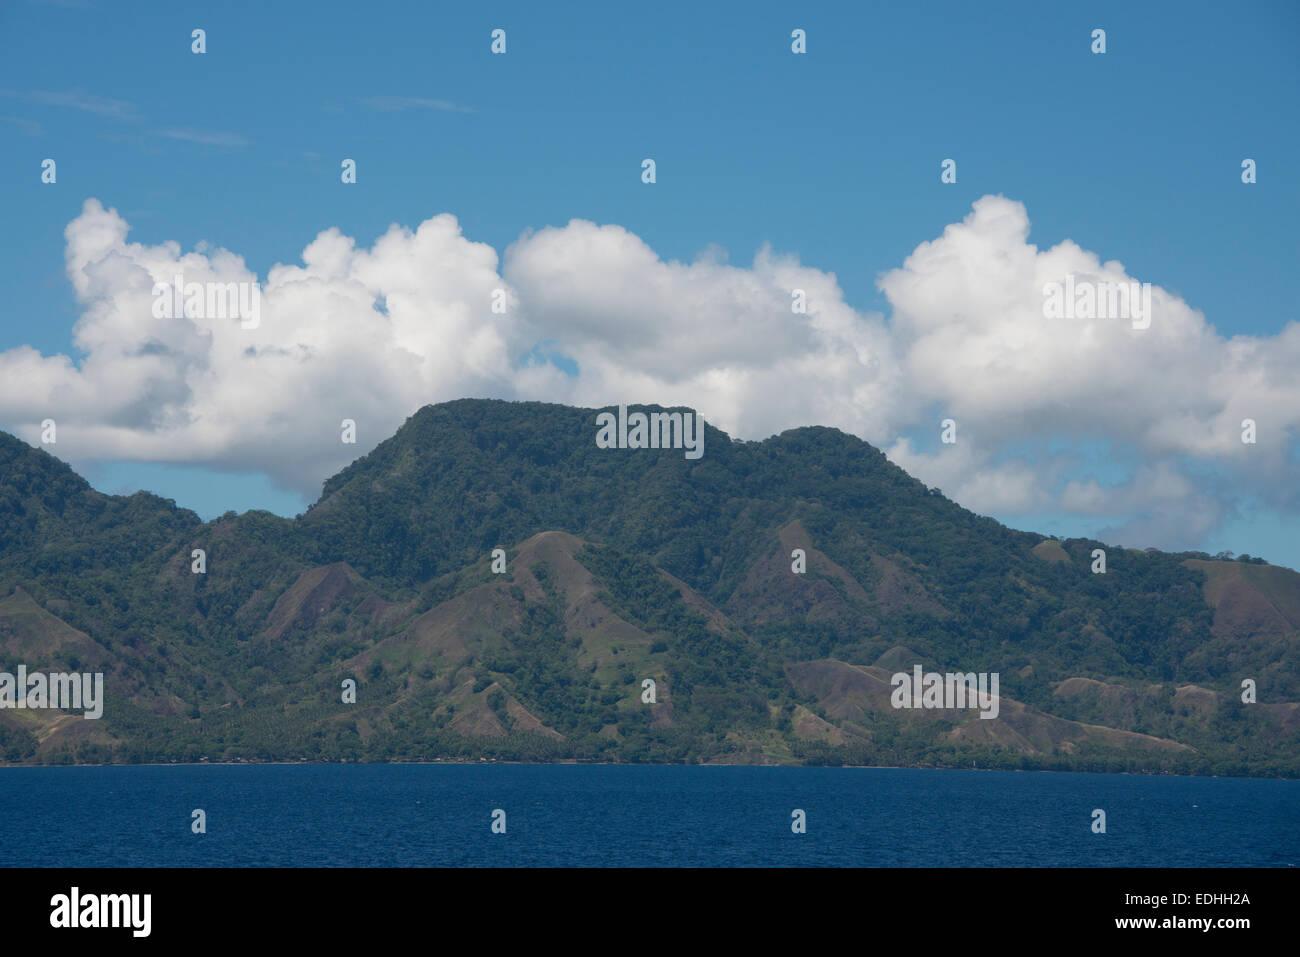 Melanesia, Solomon Islands, Guadalcanal Island. Coastal view of the area around the capital city of Honiara. - Stock Image